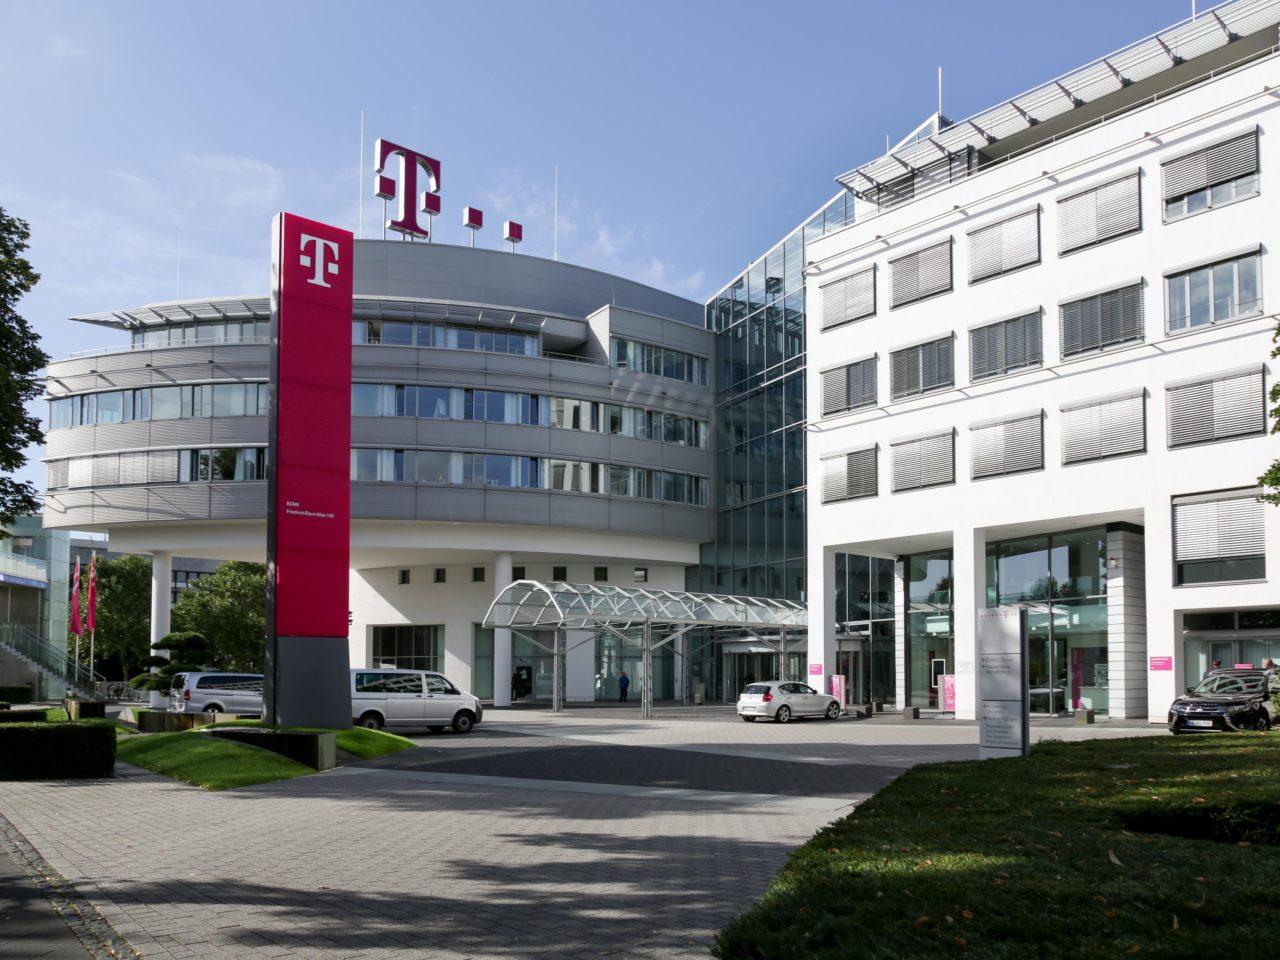 Deutsche Telekom headquarters in Bonn, Germany. Photo: Deutsche Telekom.